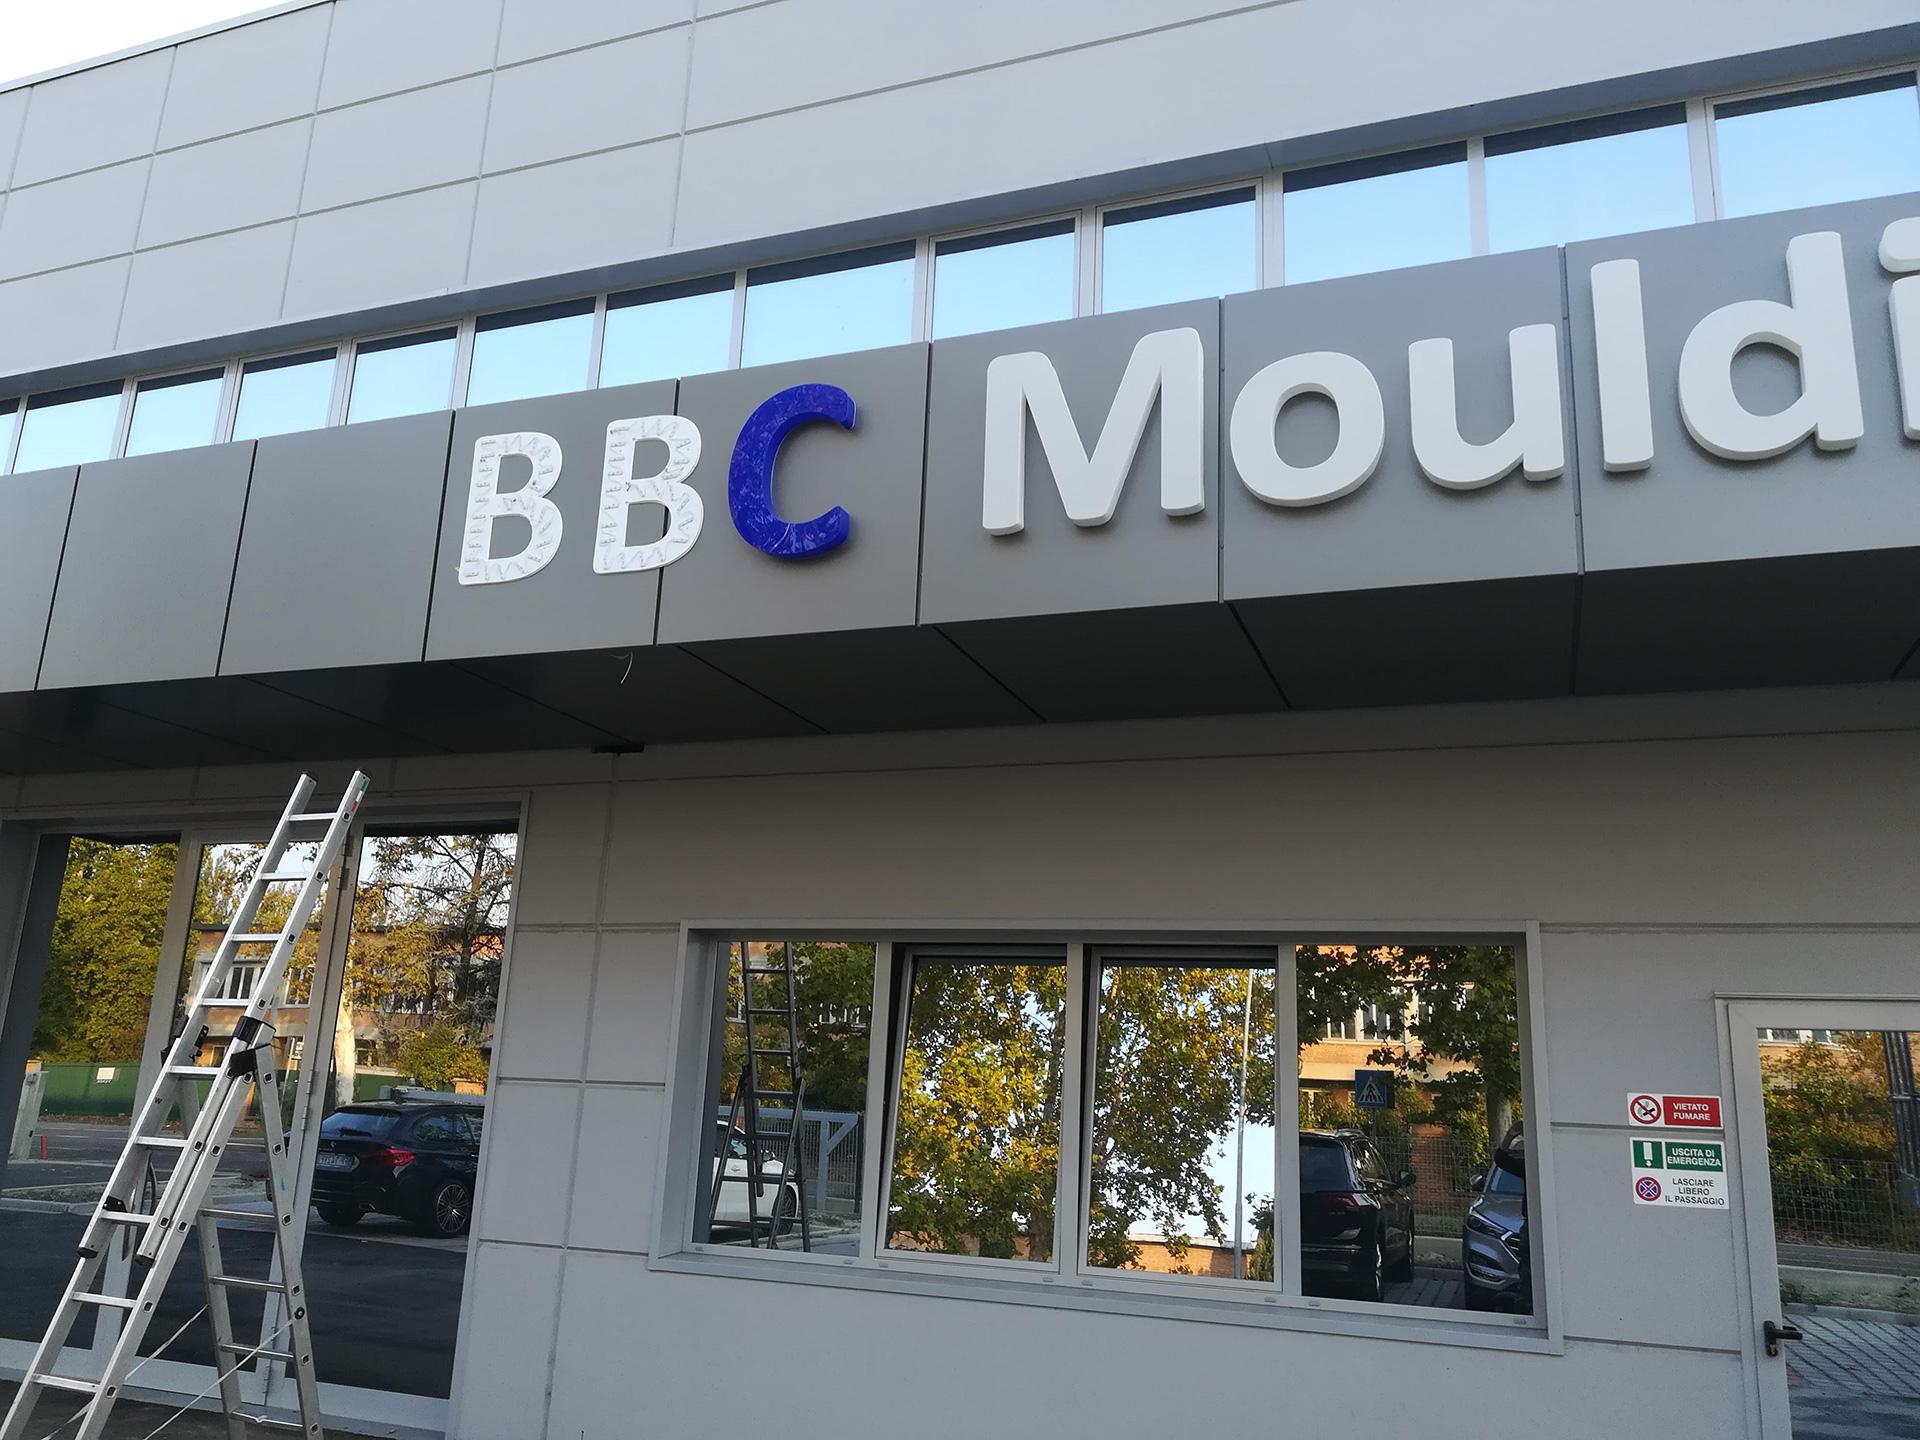 Insegne Led Bbc Moulding Pvc Sericart2